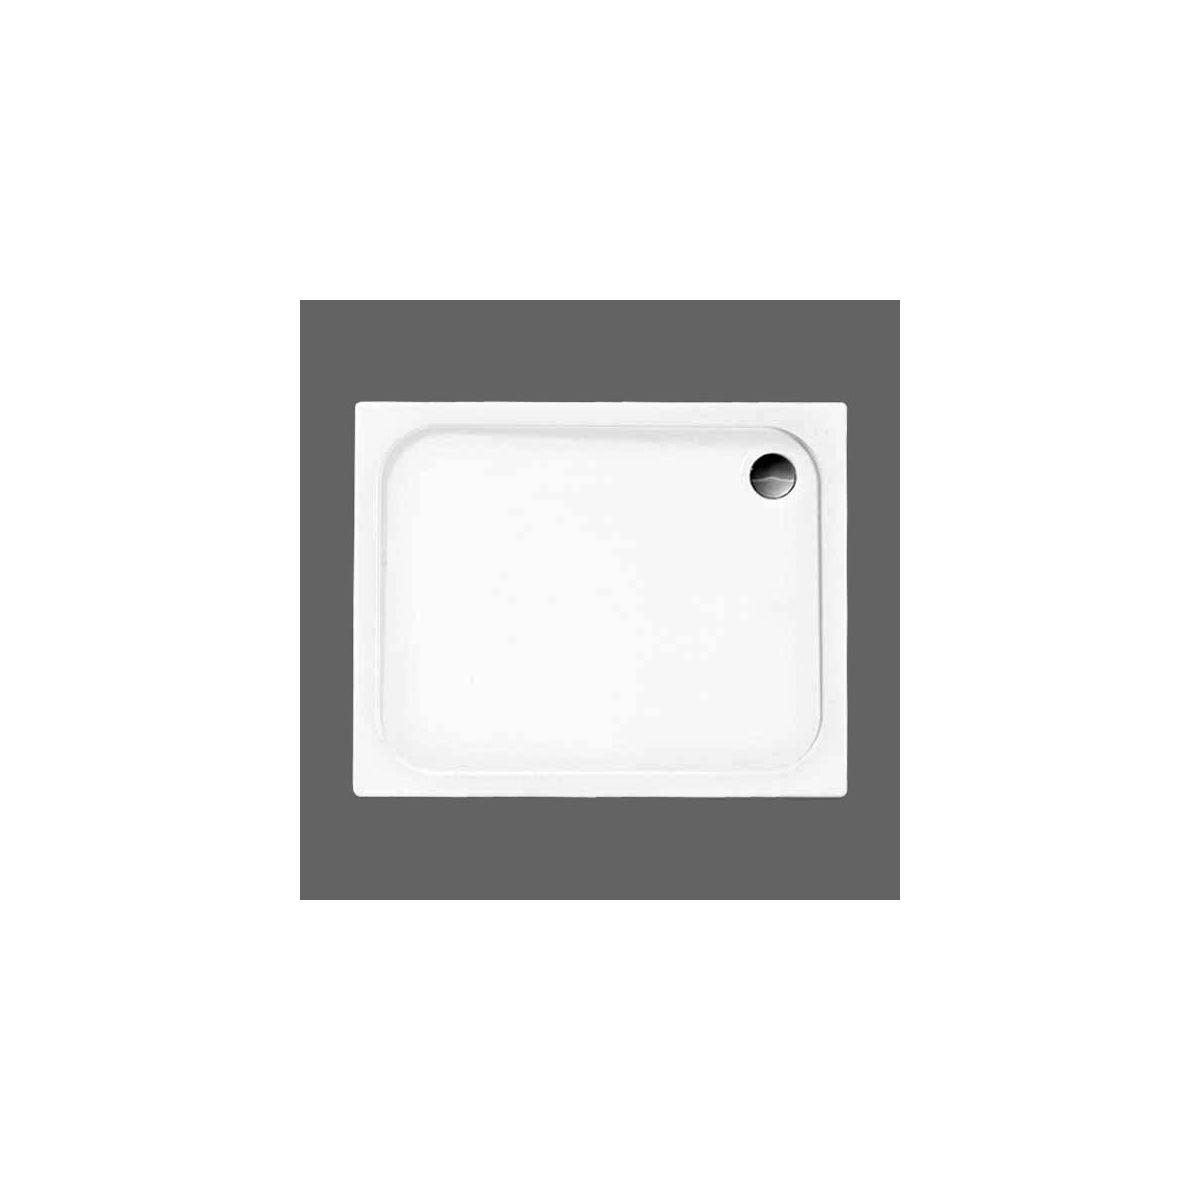 merlyn-mstone-rectangular-shower-tray-1500-x-900mm